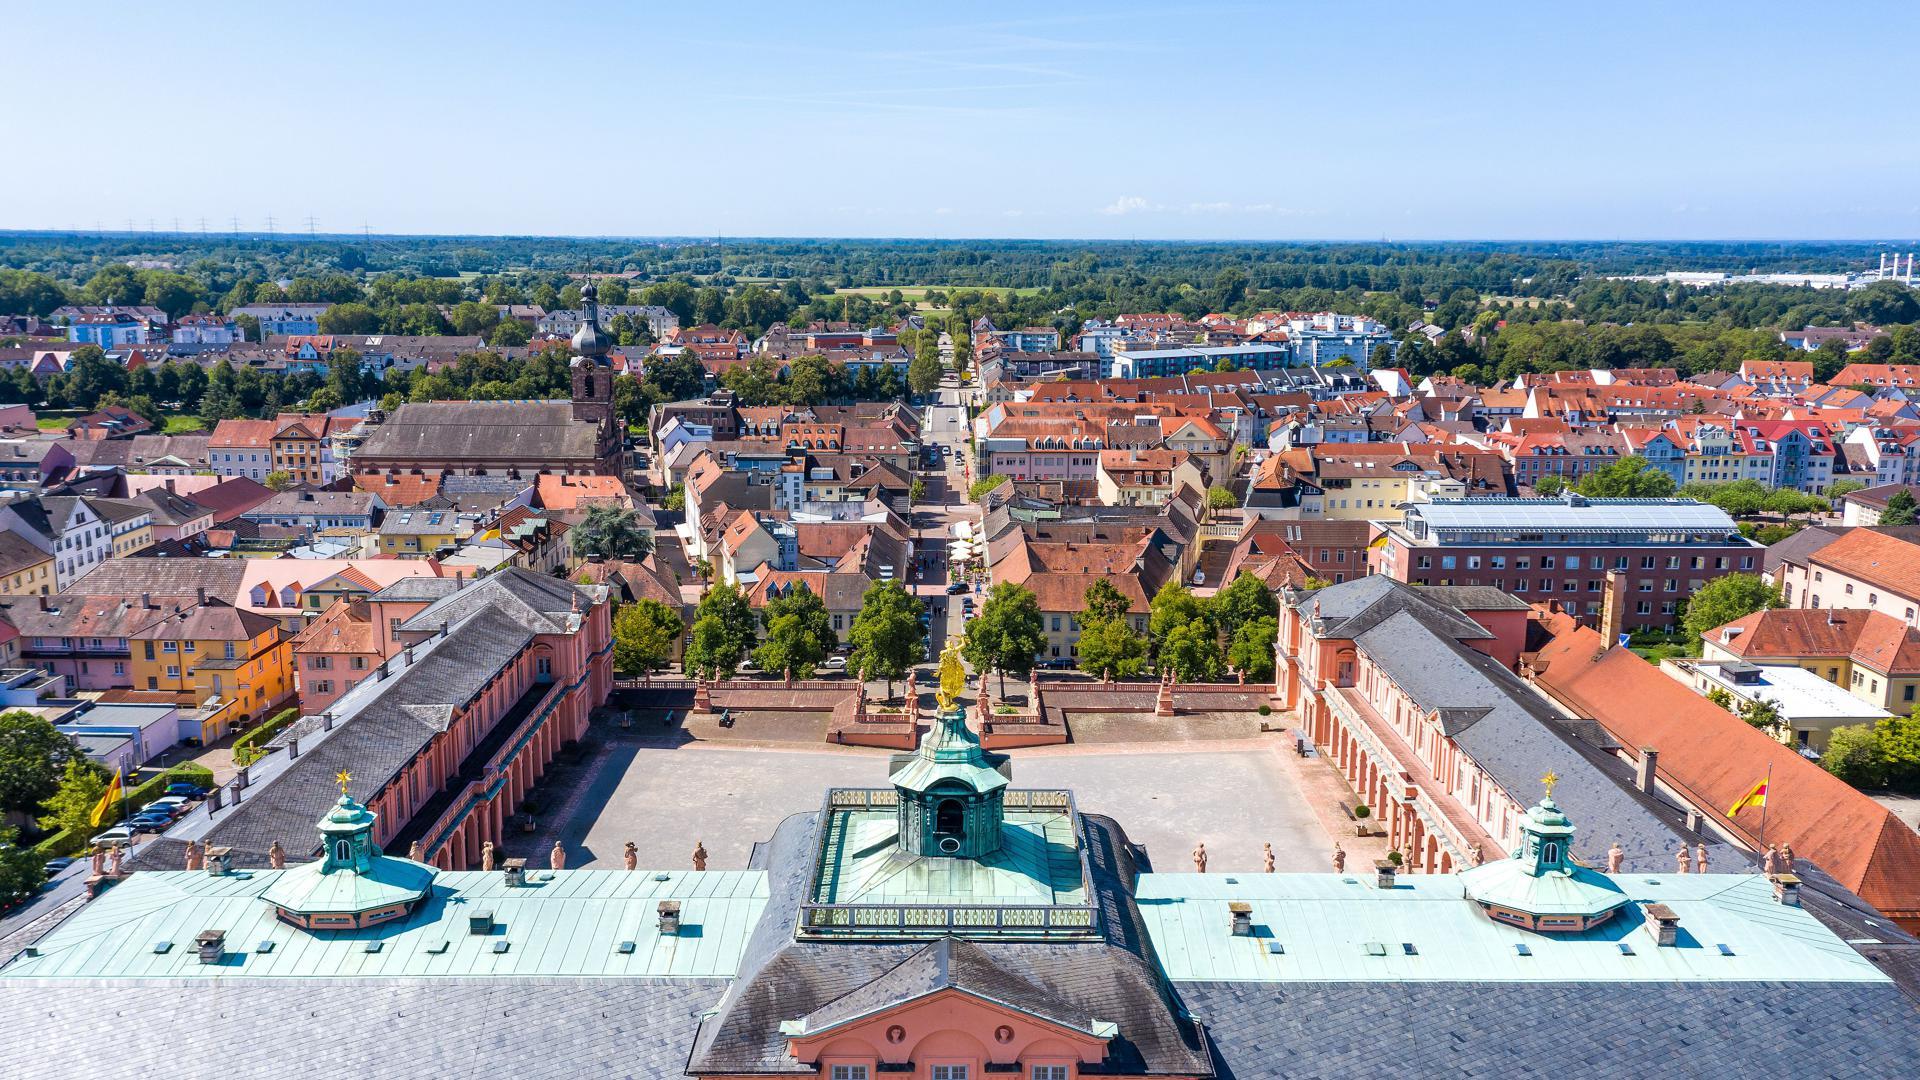 Panoramabild von Rastatt mit dem Barockschloss.